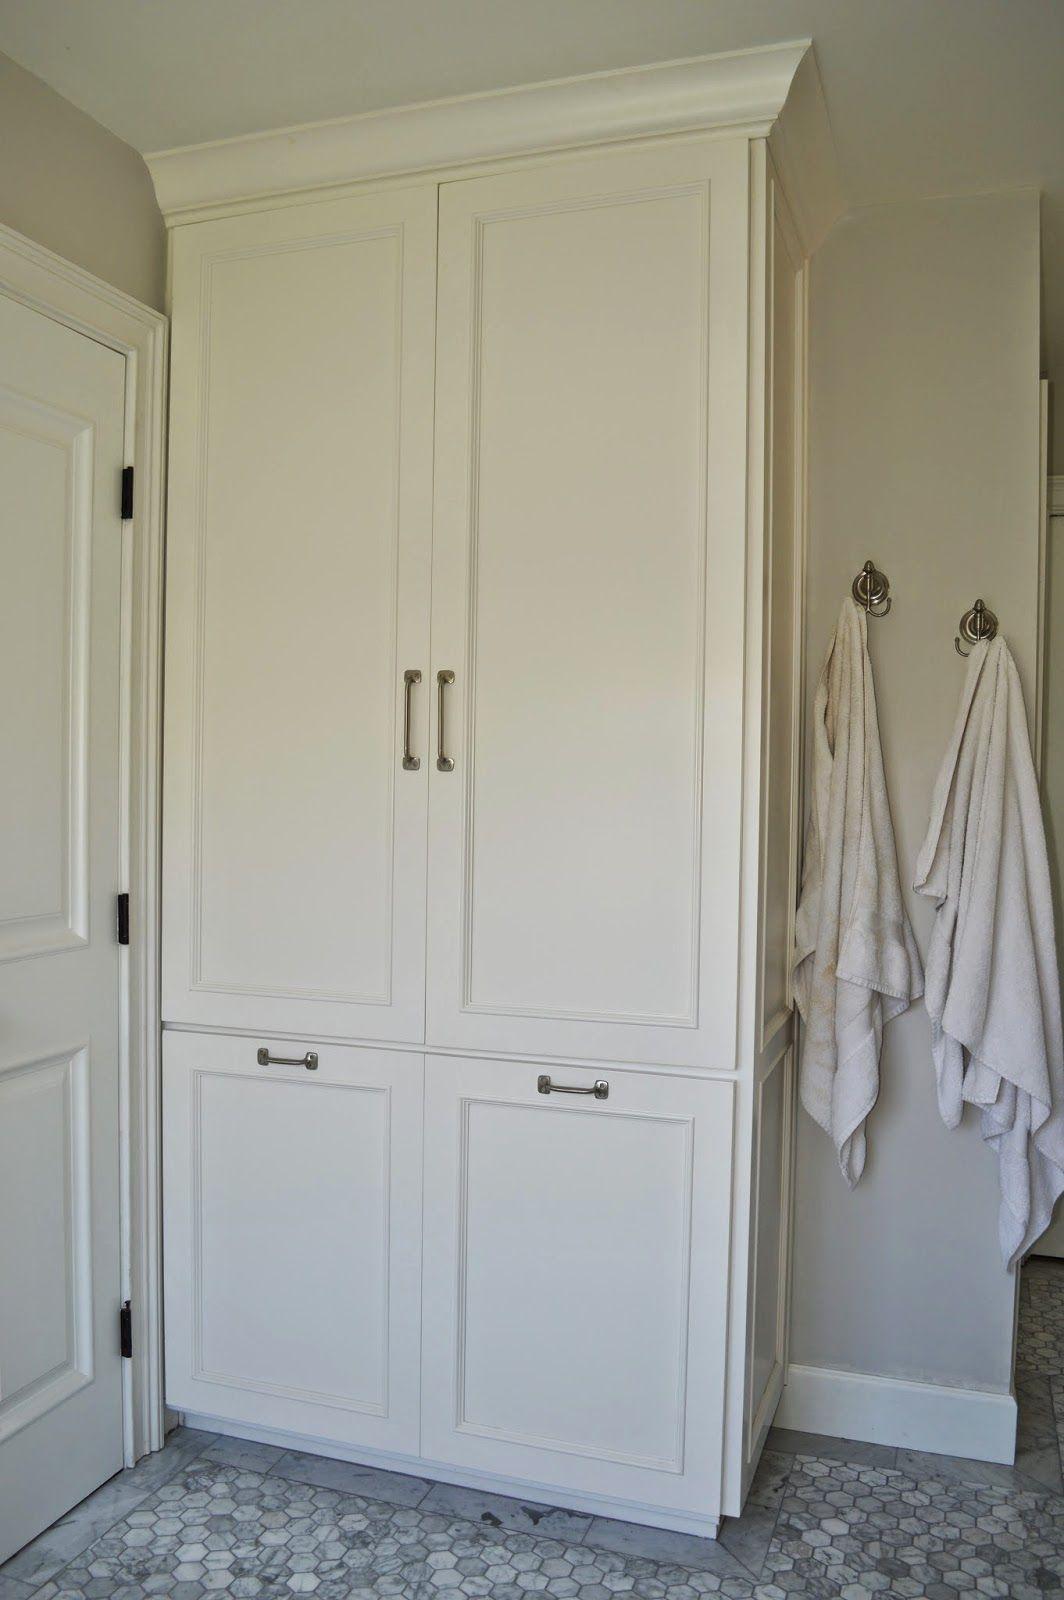 The Double Doors I Adore Going Into The Bathroom And Open Looking Into The Bathroom The Ba Built In Bathroom Storage Bathroom Linen Closet Linen Cabinets